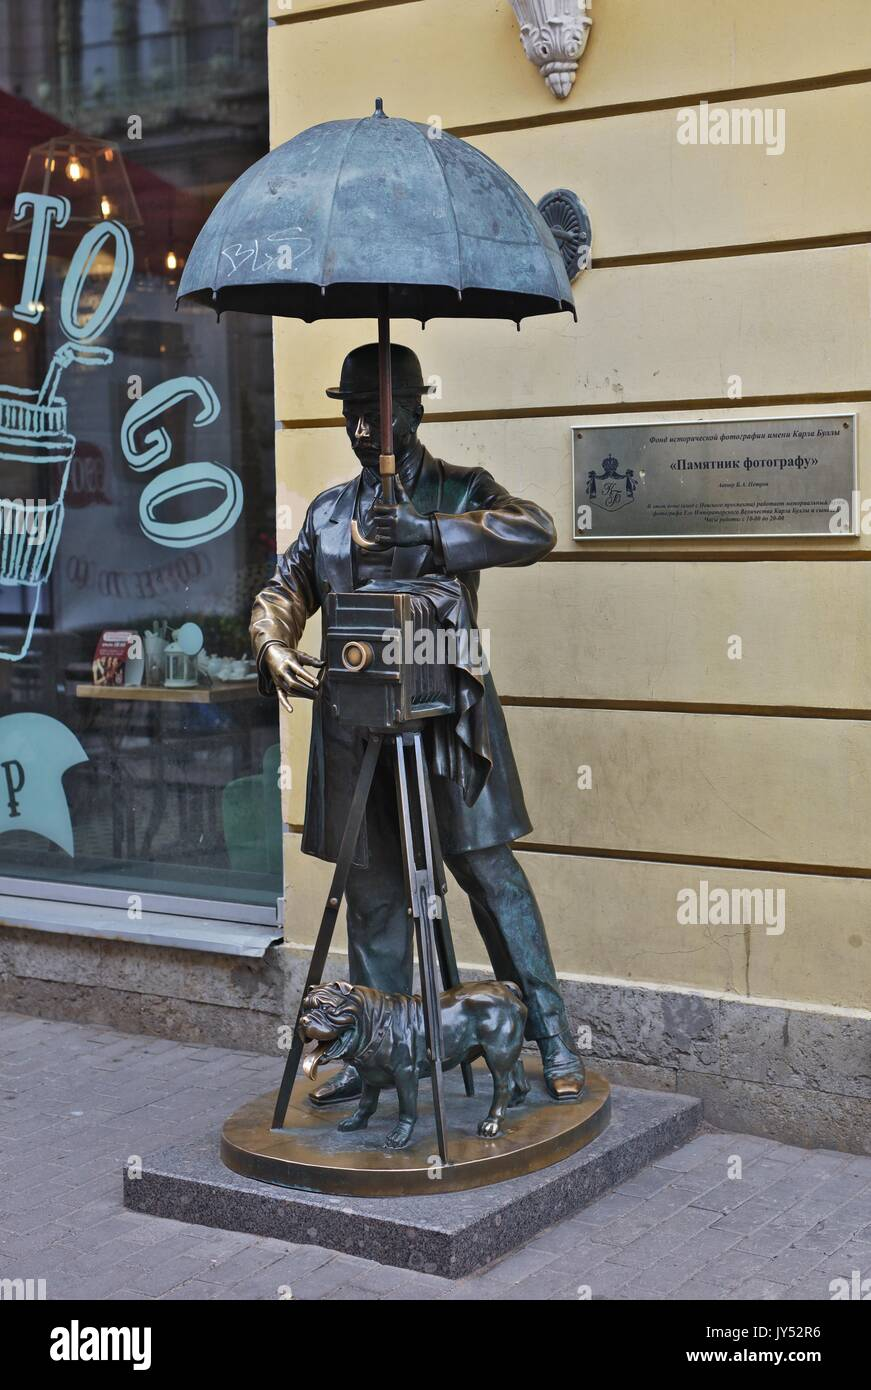 Bronze sculpture of a Photographer - Stock Image